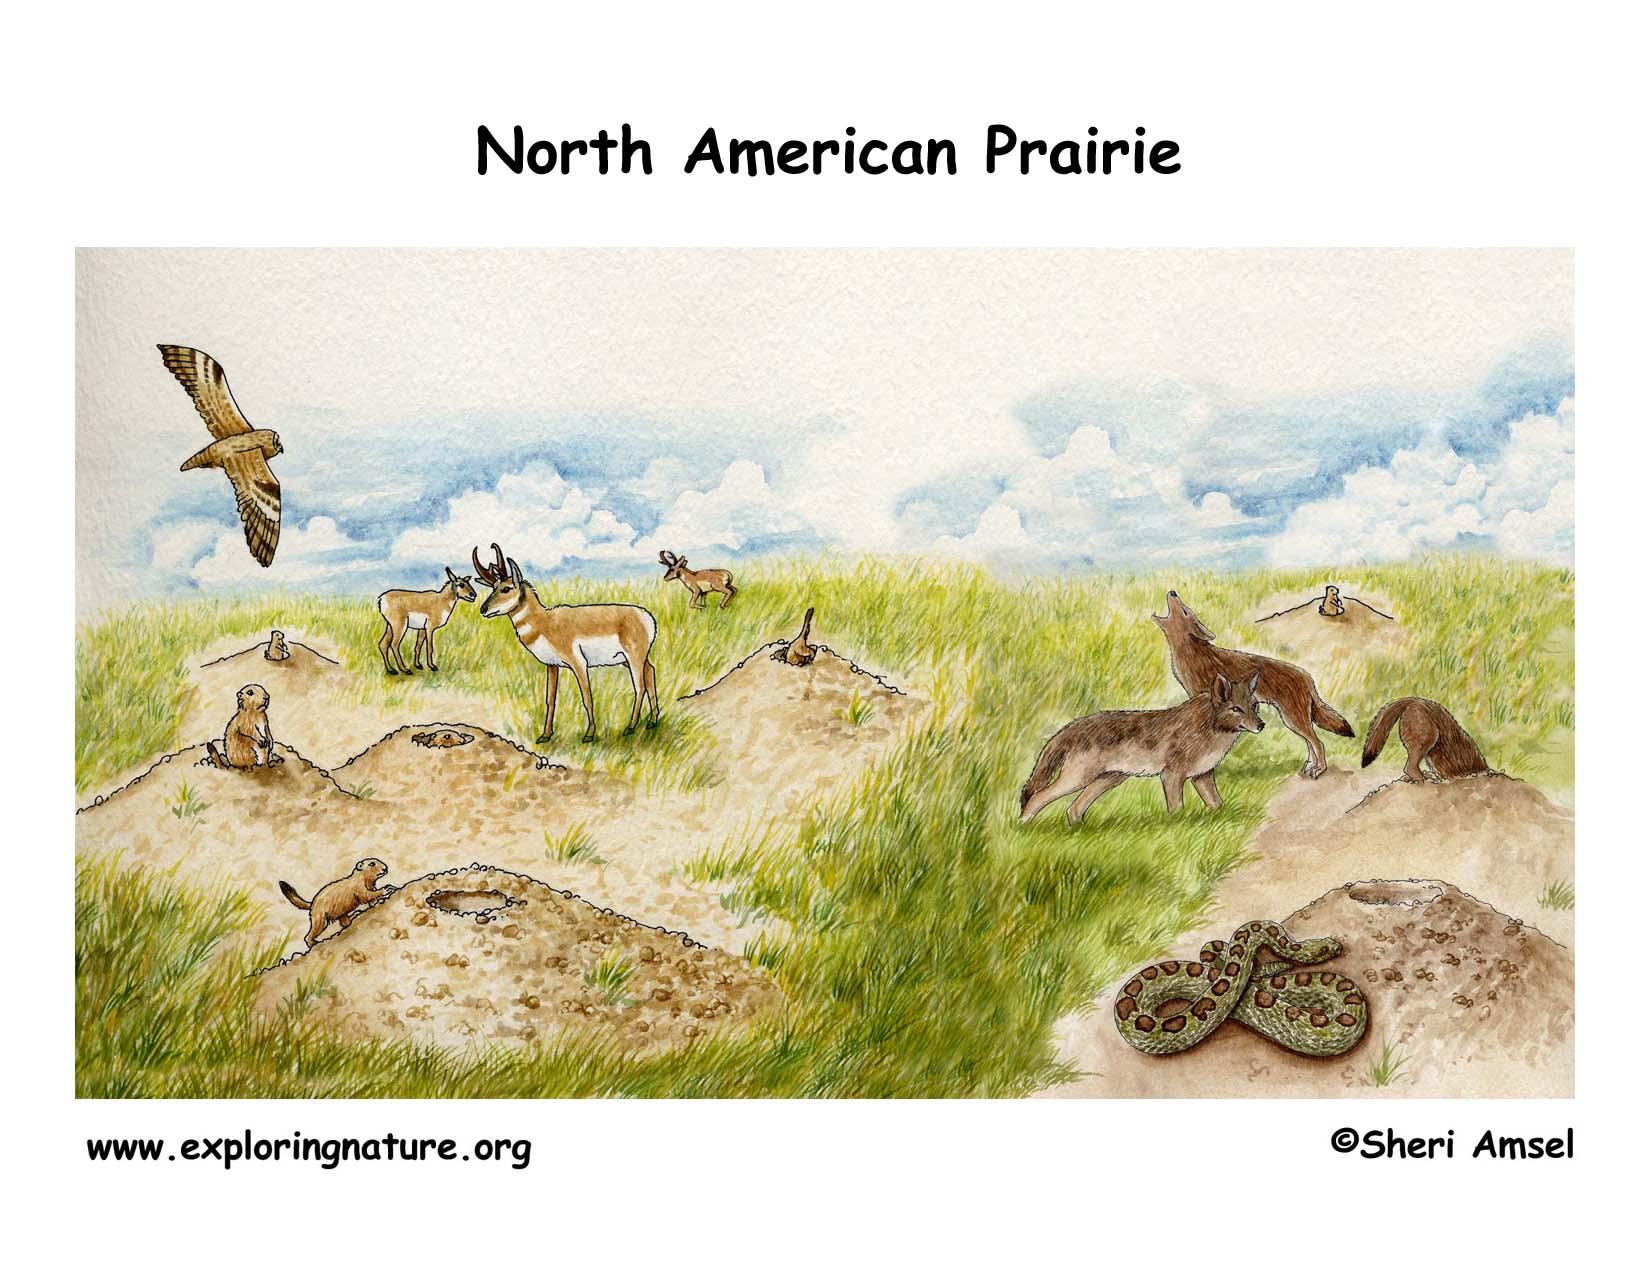 Grassland animals and plants food web - photo#14